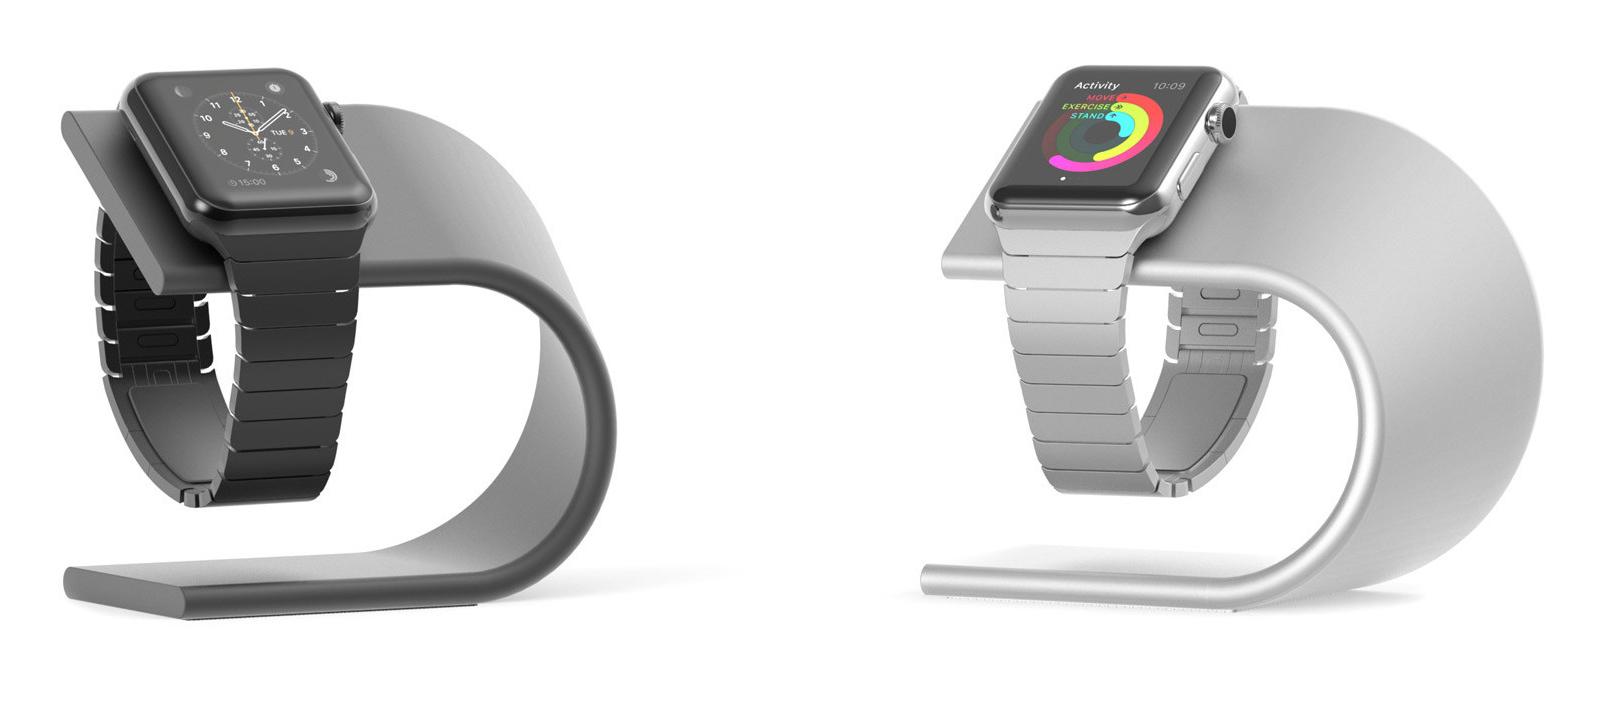 nomad-apple-watch-aluminum-charging-dock